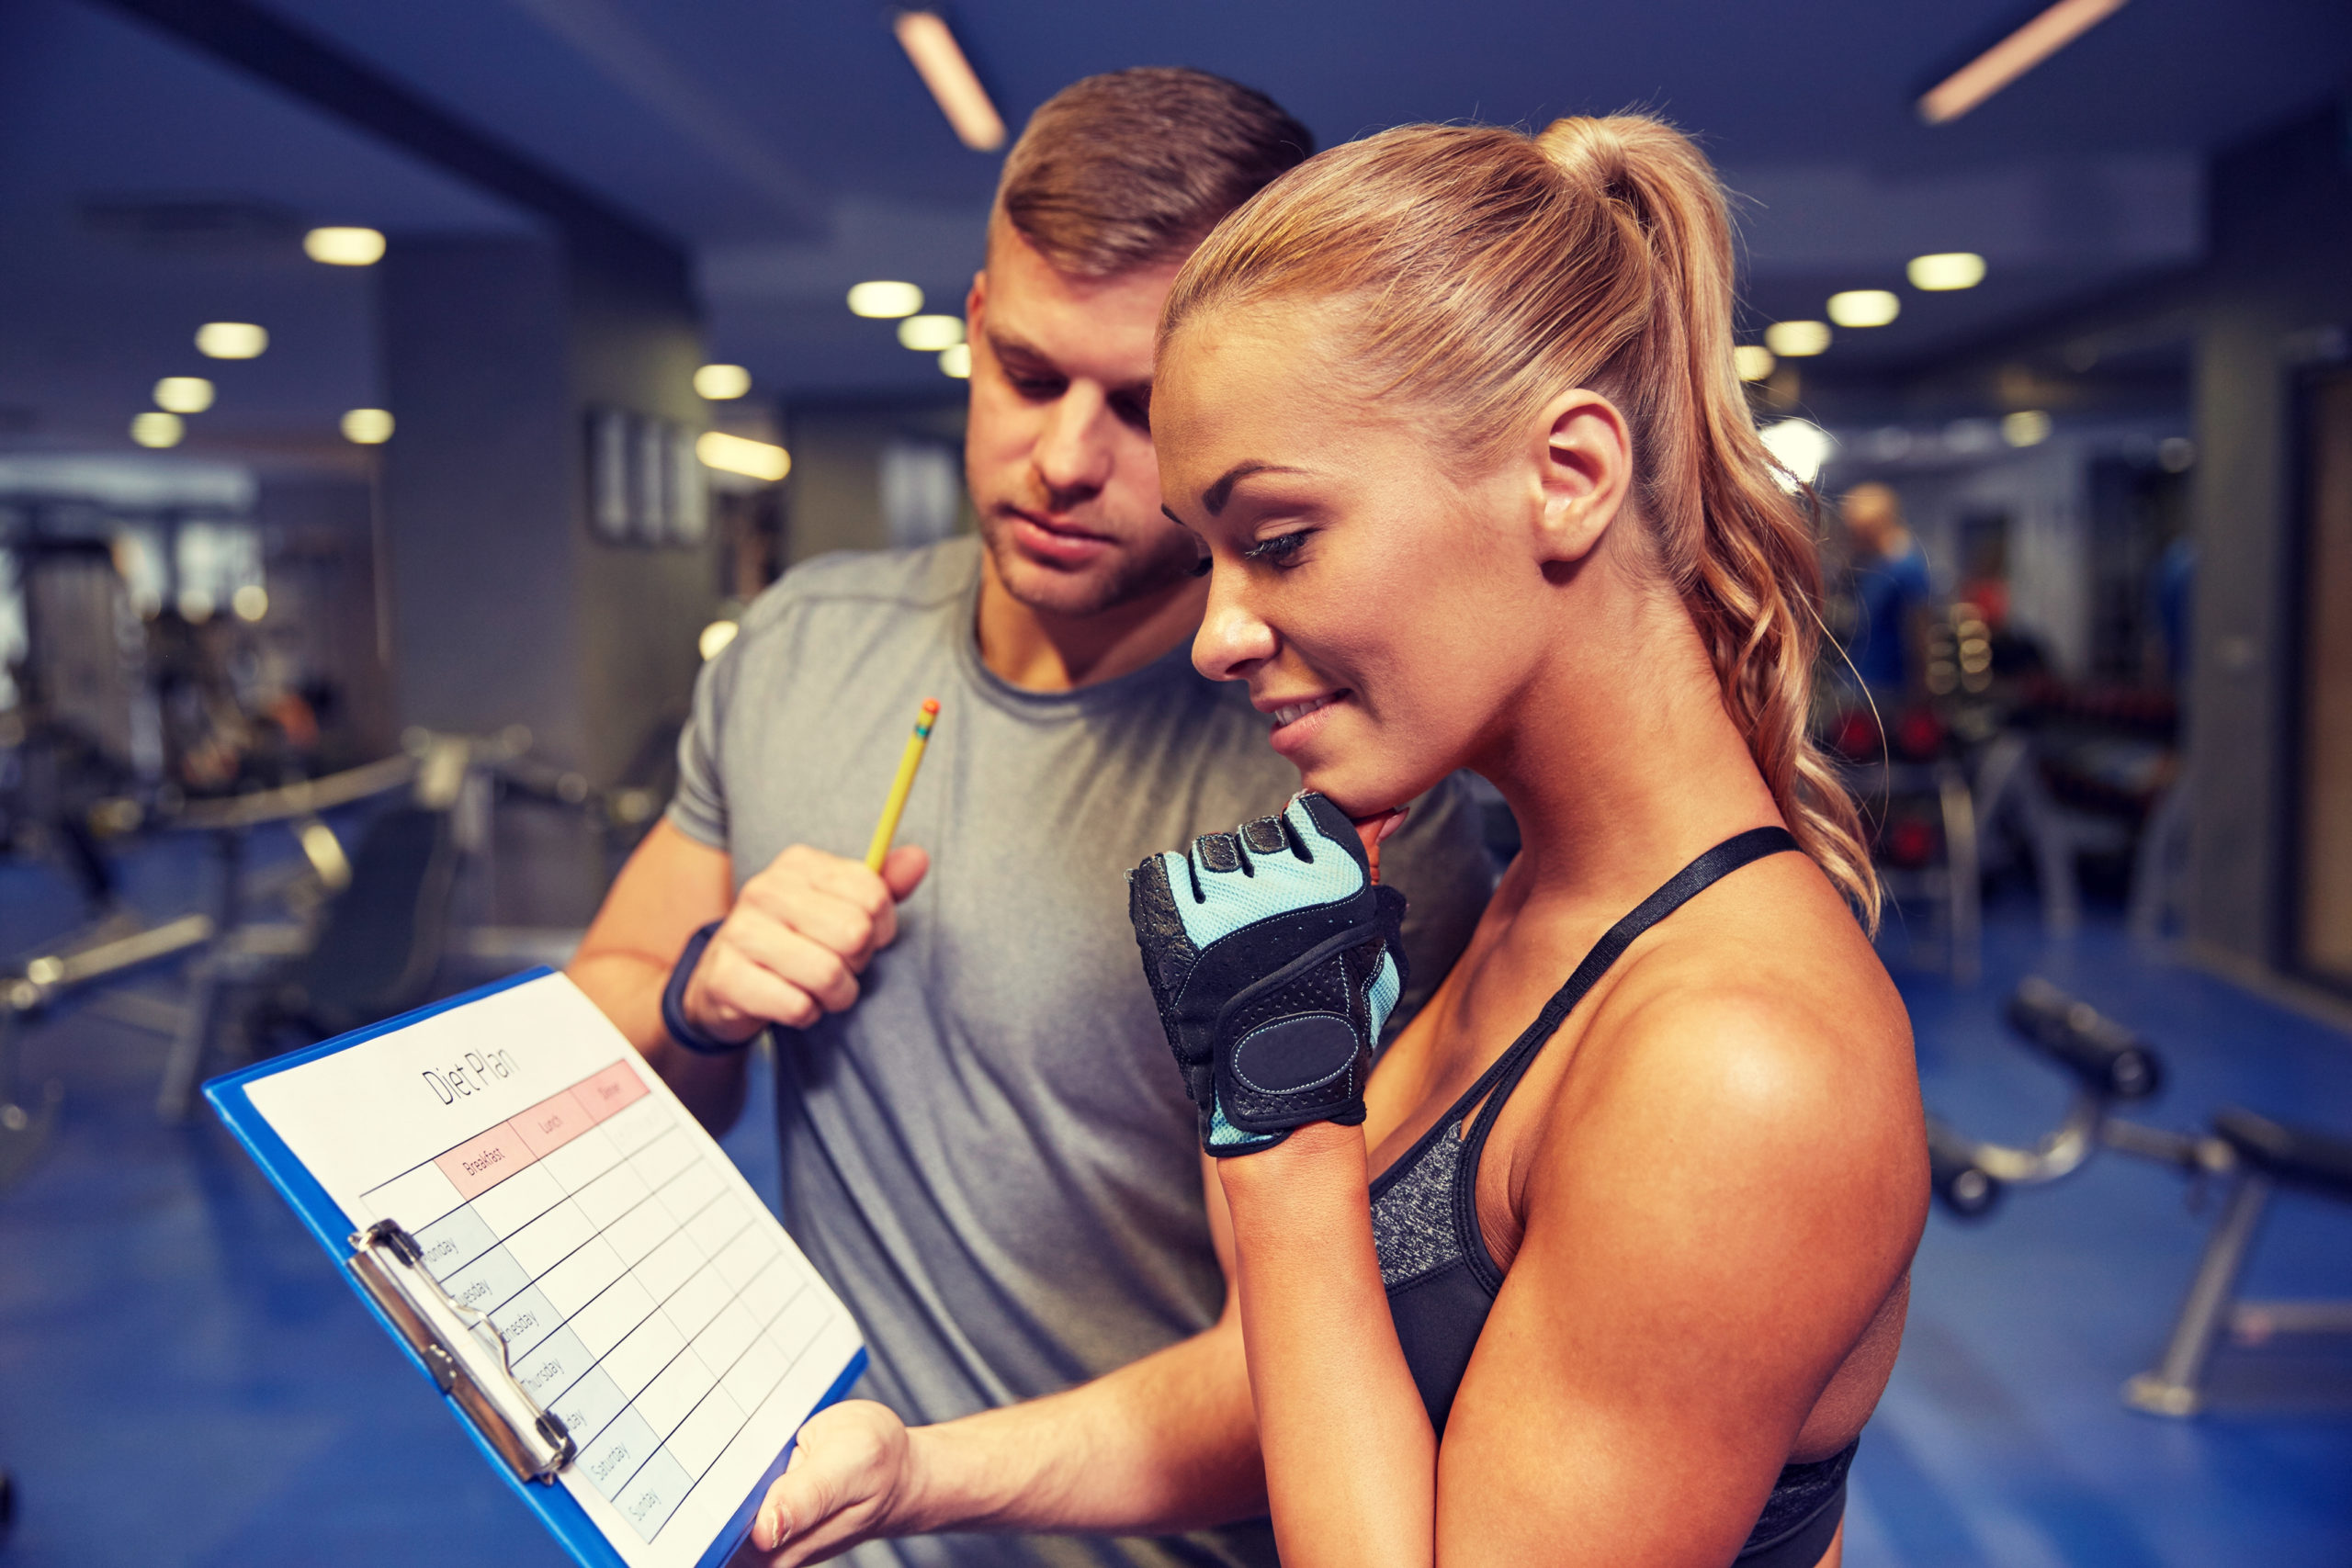 kobieta, trener personalny, plan treningowy; trener freelancer, trener na umowie, trener na etacie